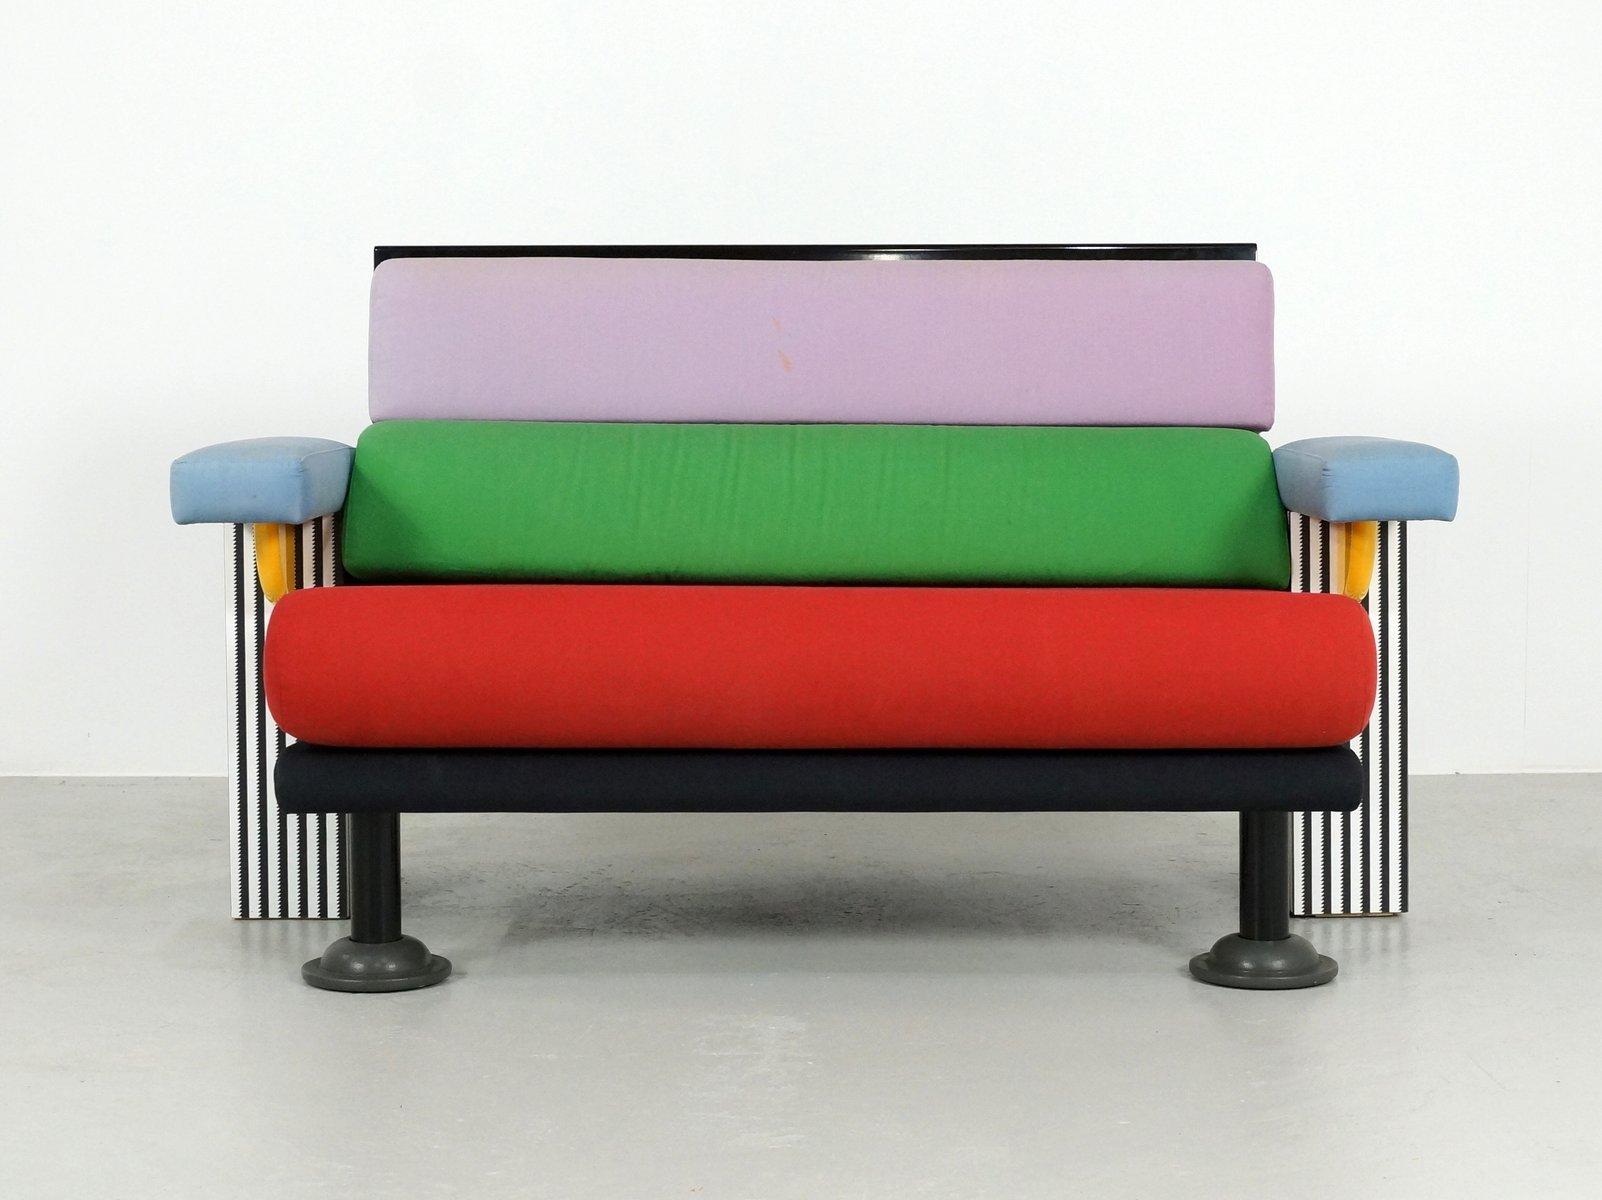 Lido Sofa By Michele De Lucchi For Memphis 1982 For Sale